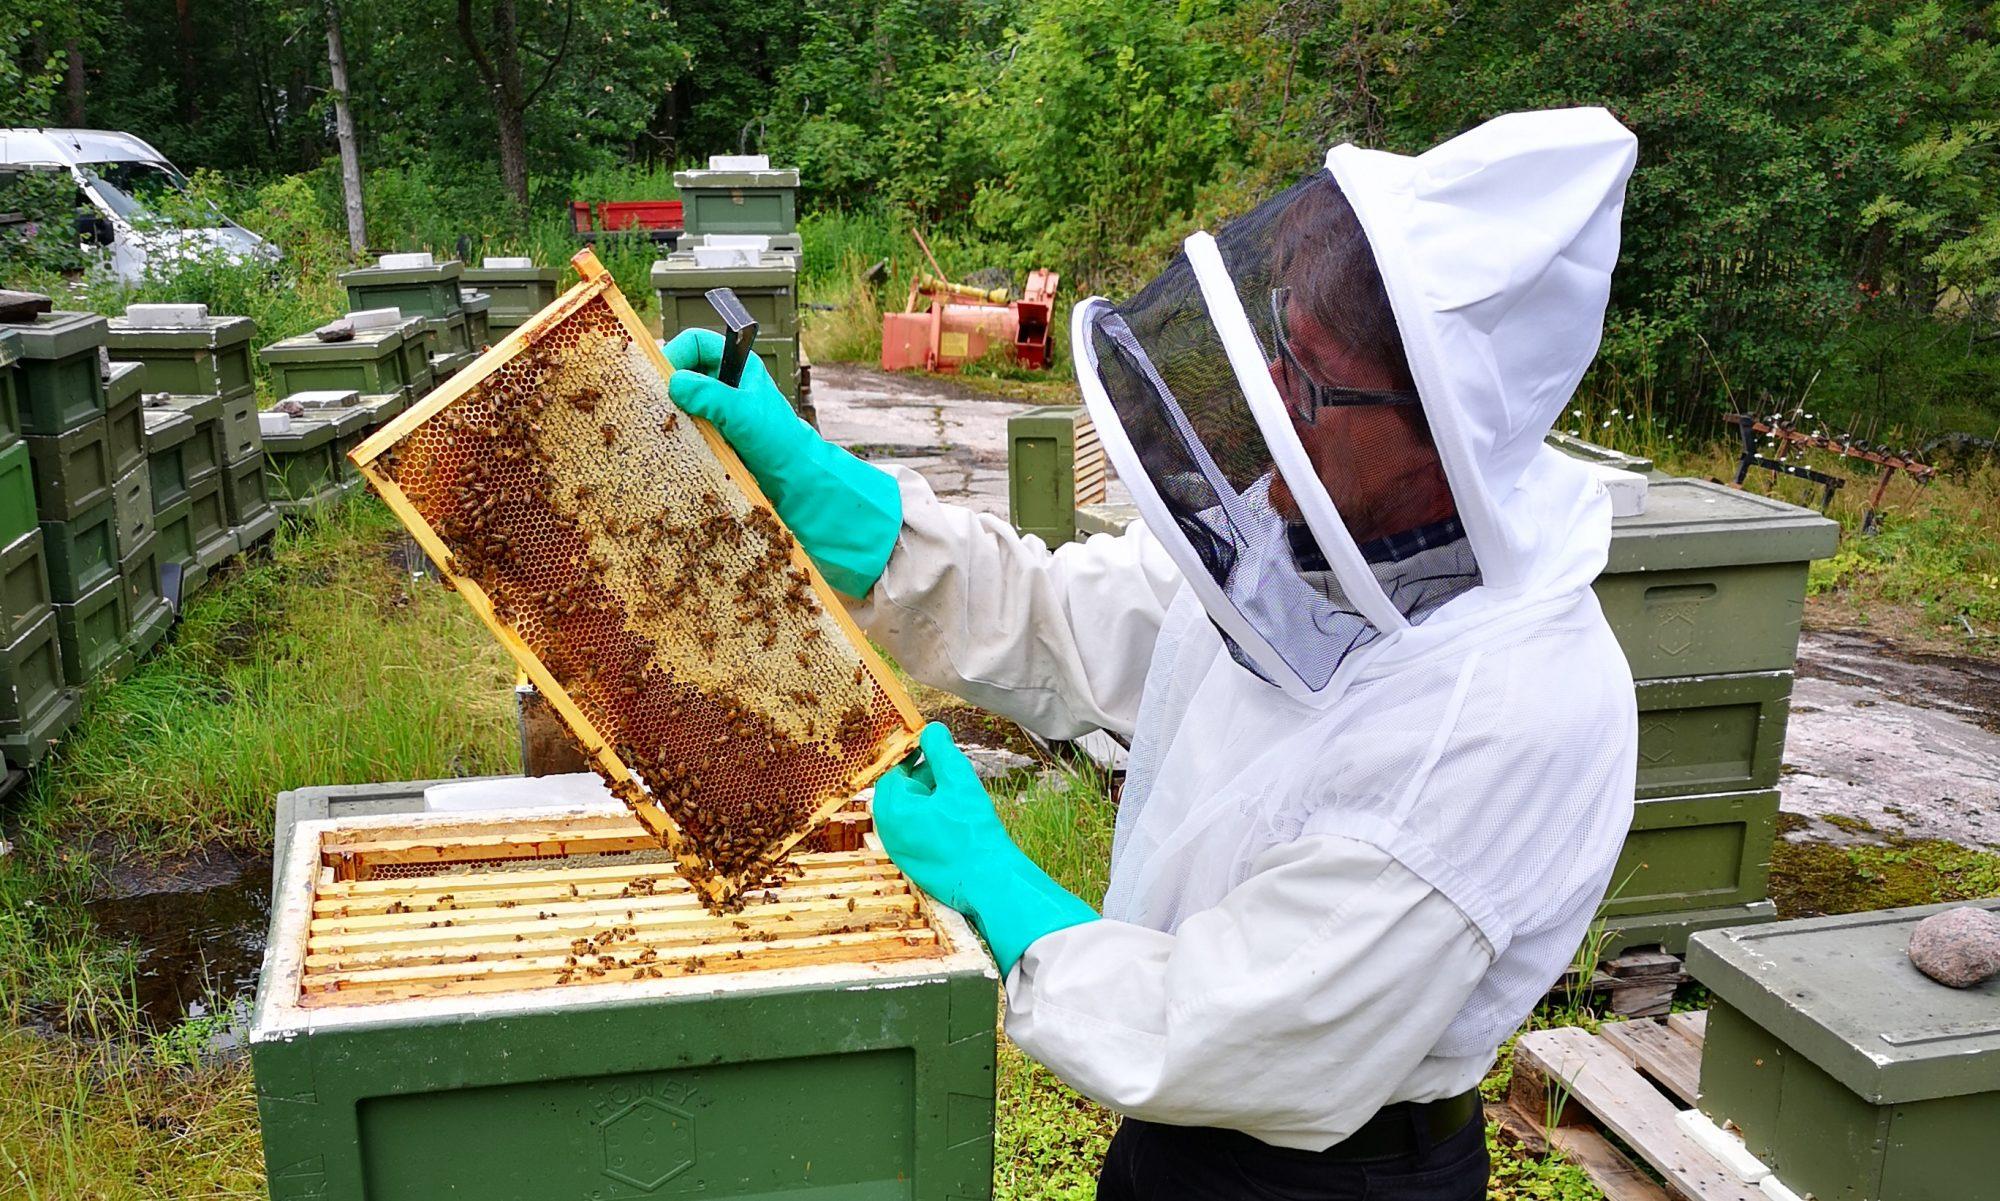 P.E.T. Bees Oy